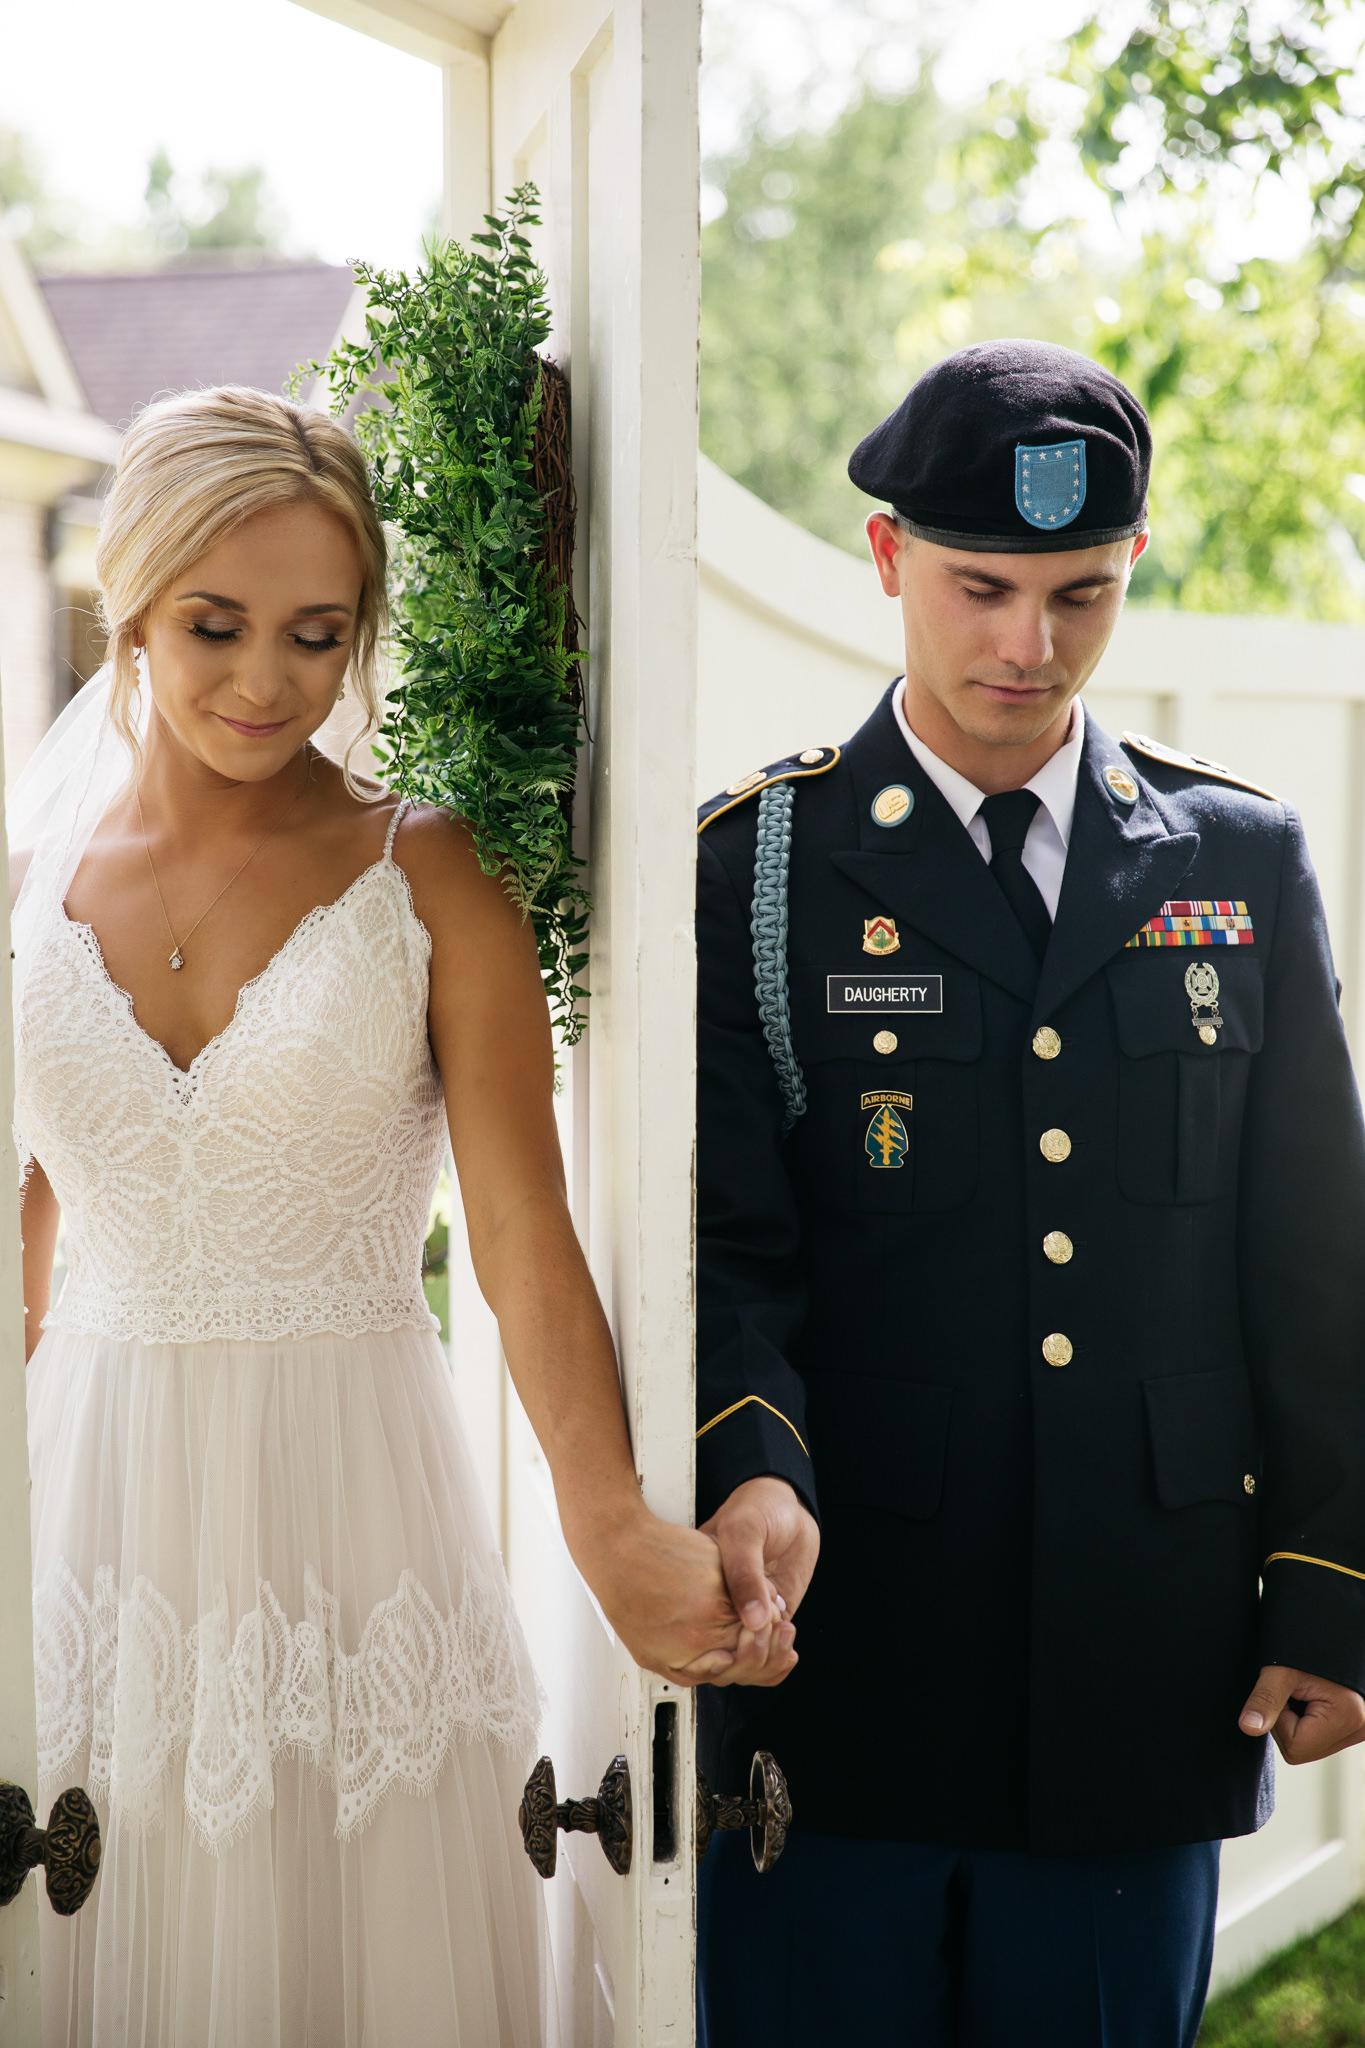 backyard-wedding-thewarmtharoundyou-lexy-branson-31.jpg